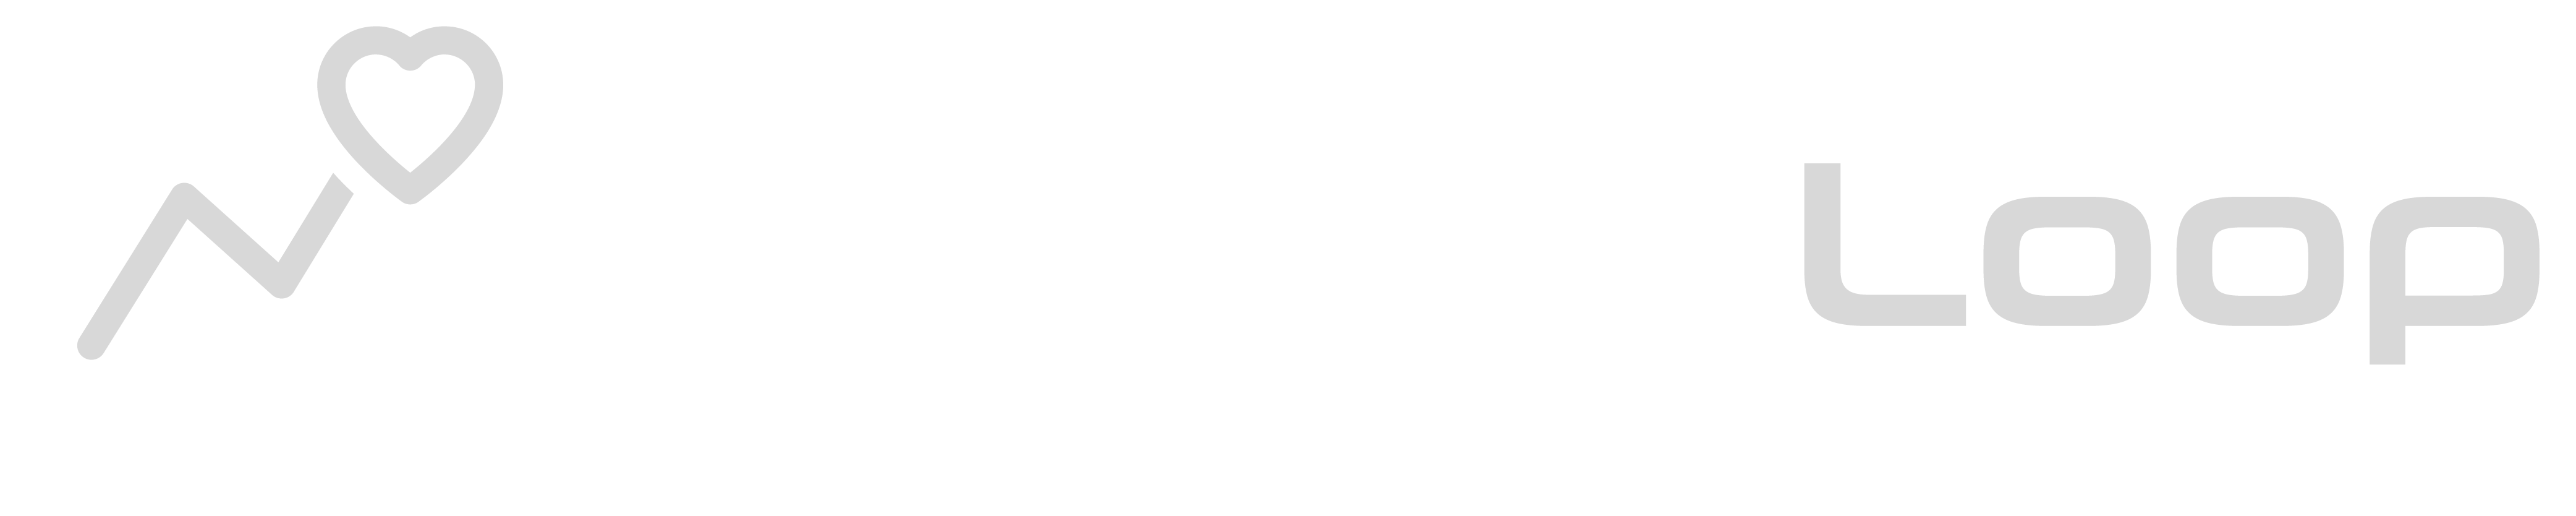 ProductLoop Logo